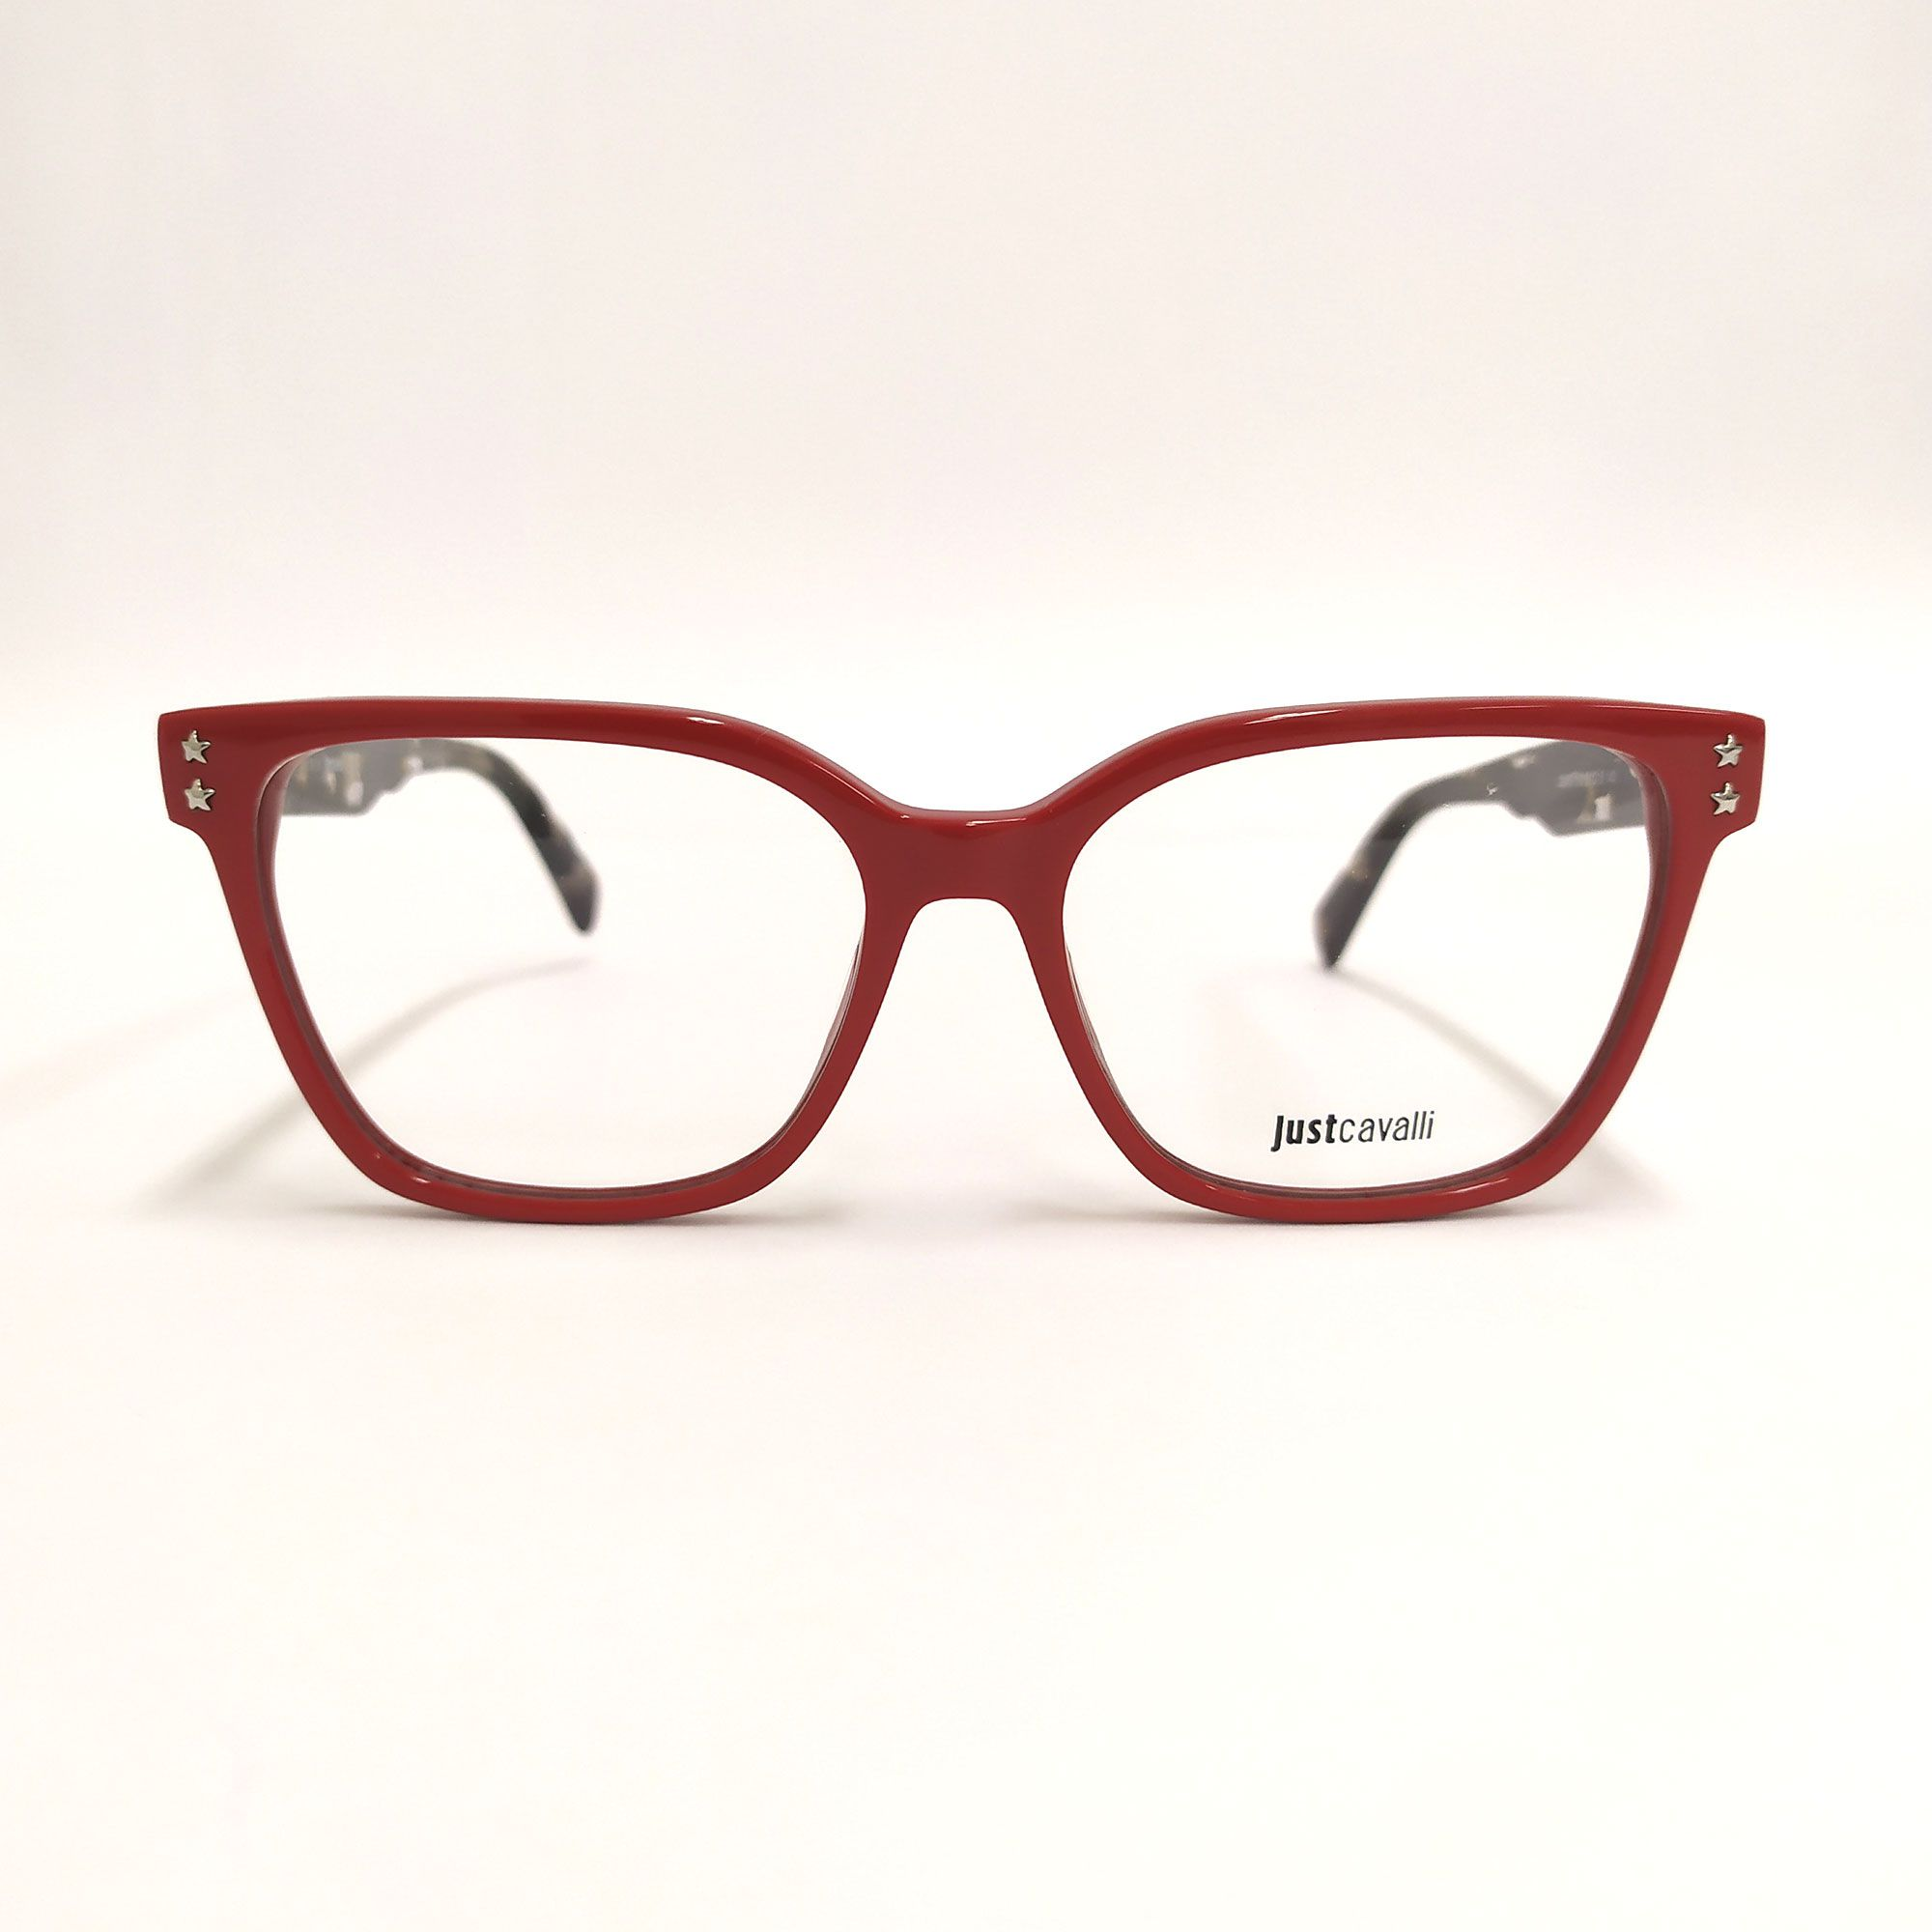 Óculos de Grau Just Cavalli Vermelho JC0845 068